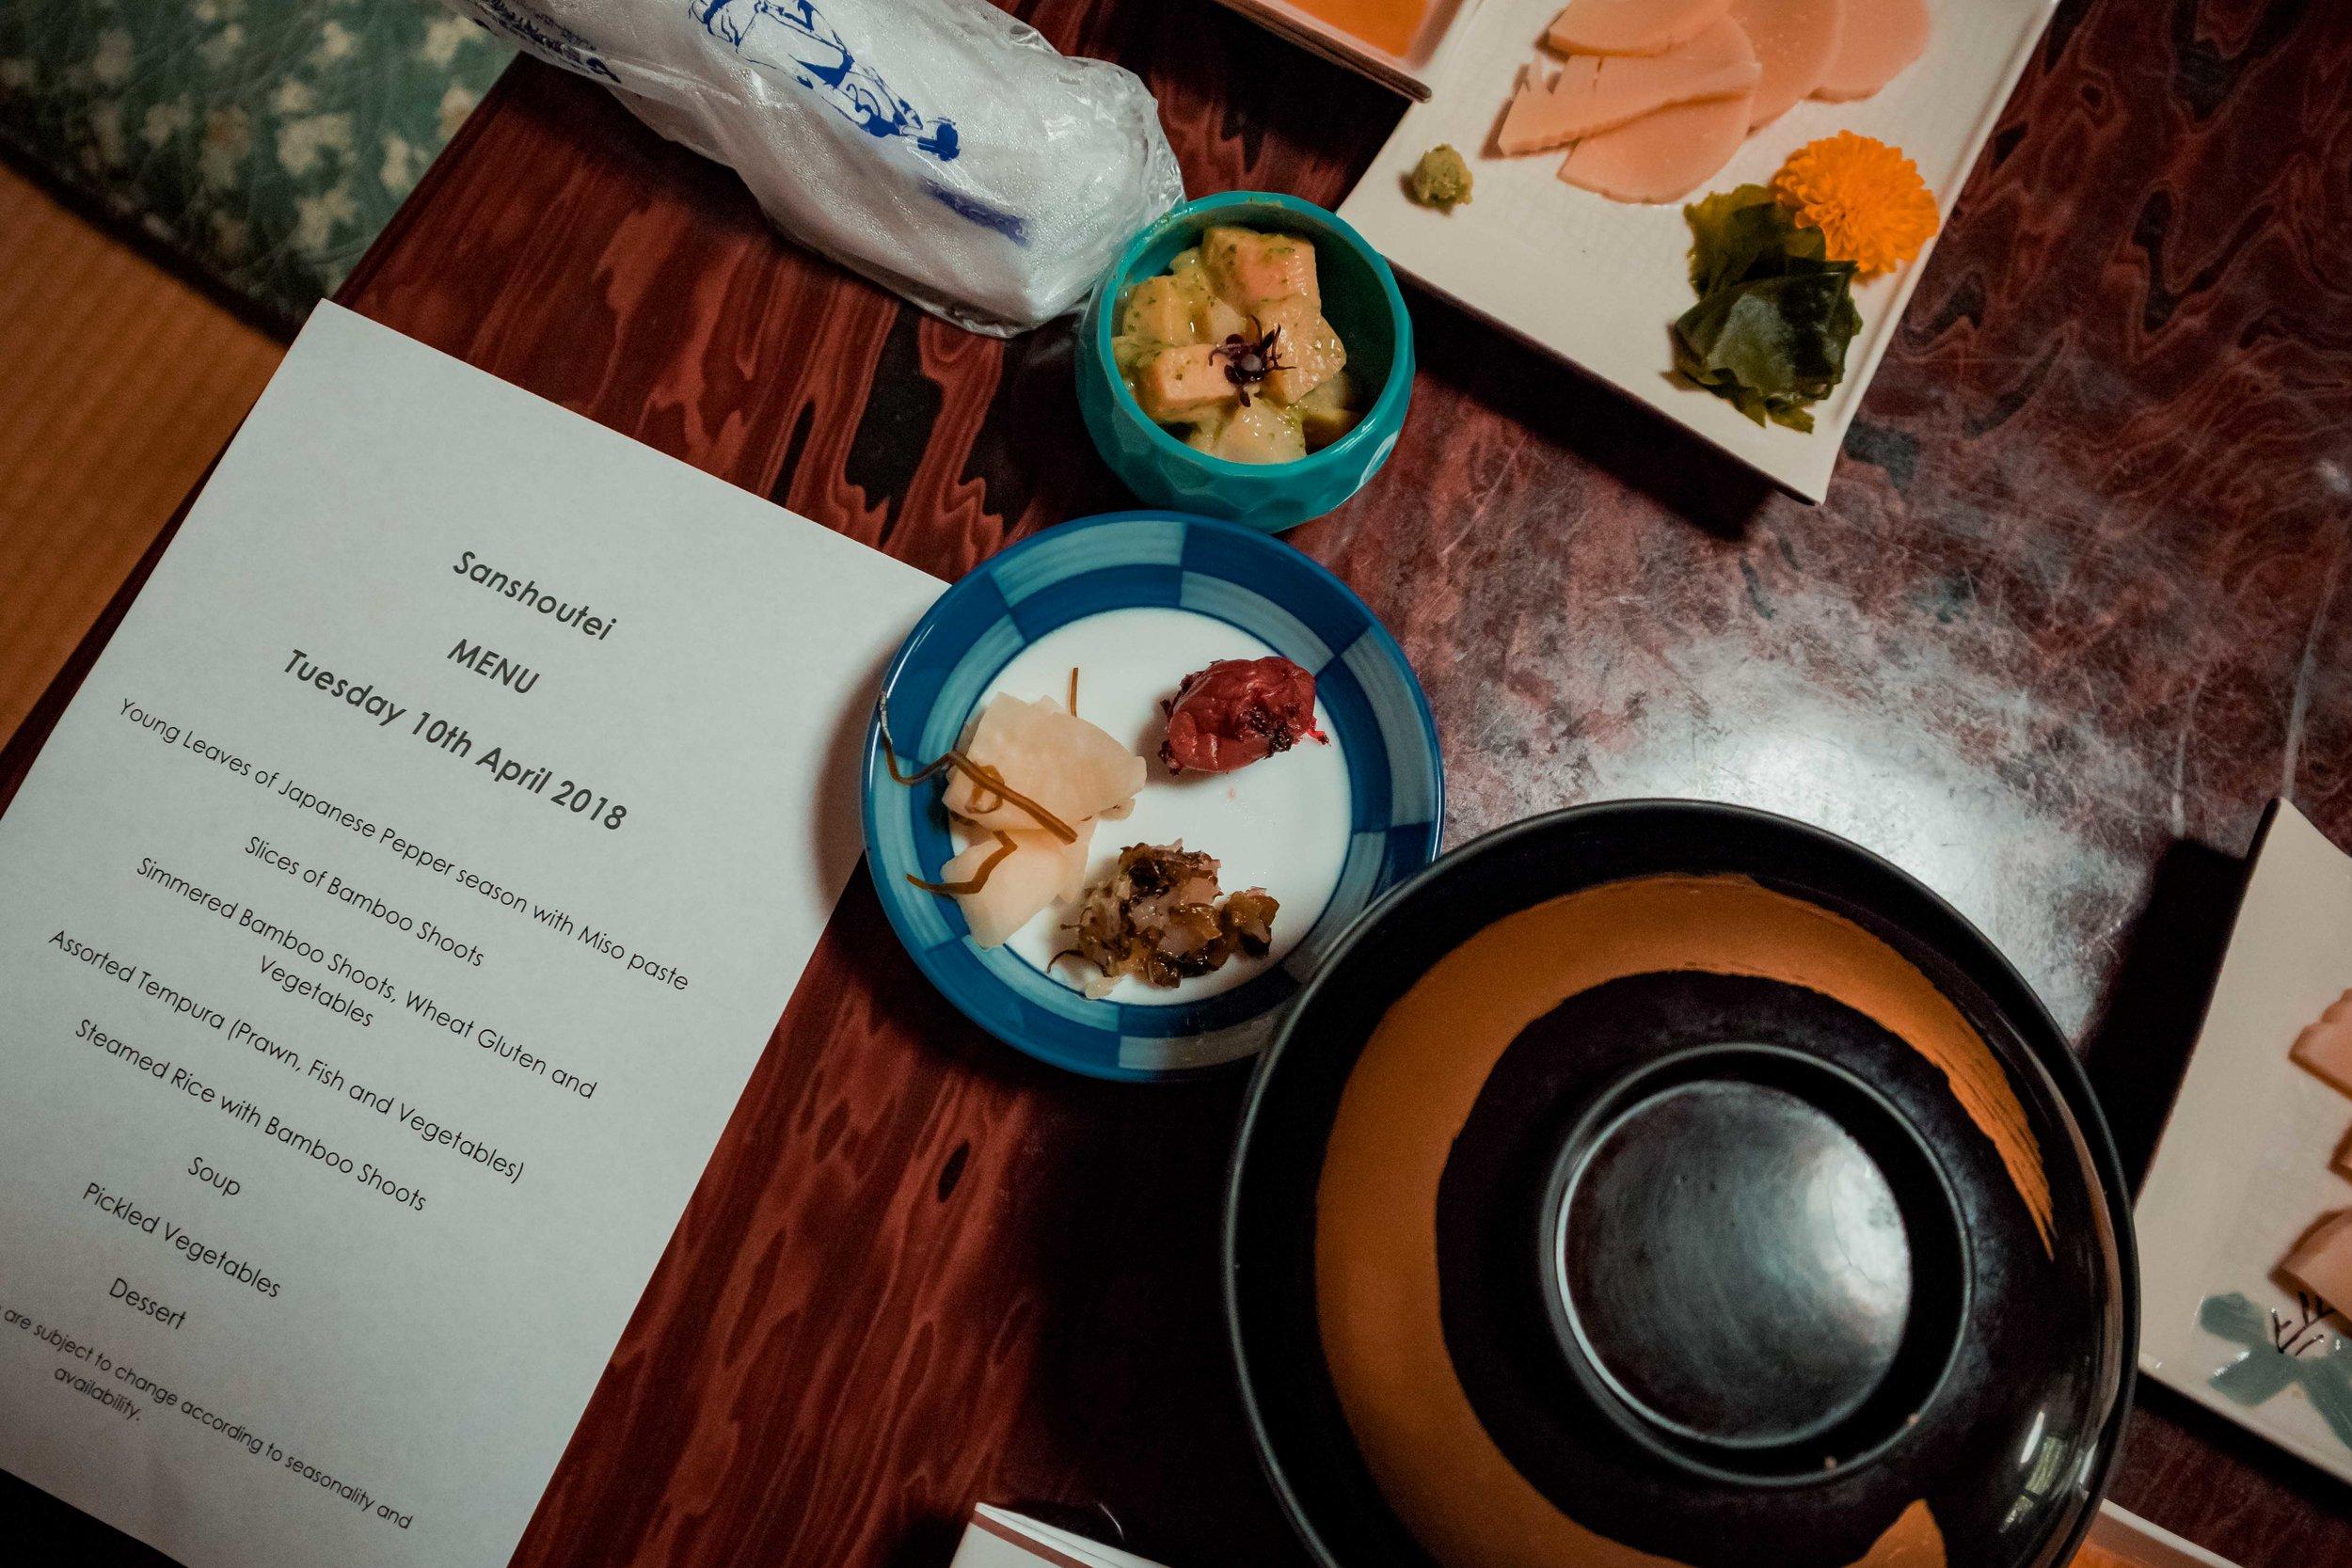 JAPAN_SMLIMG_5640.JPG